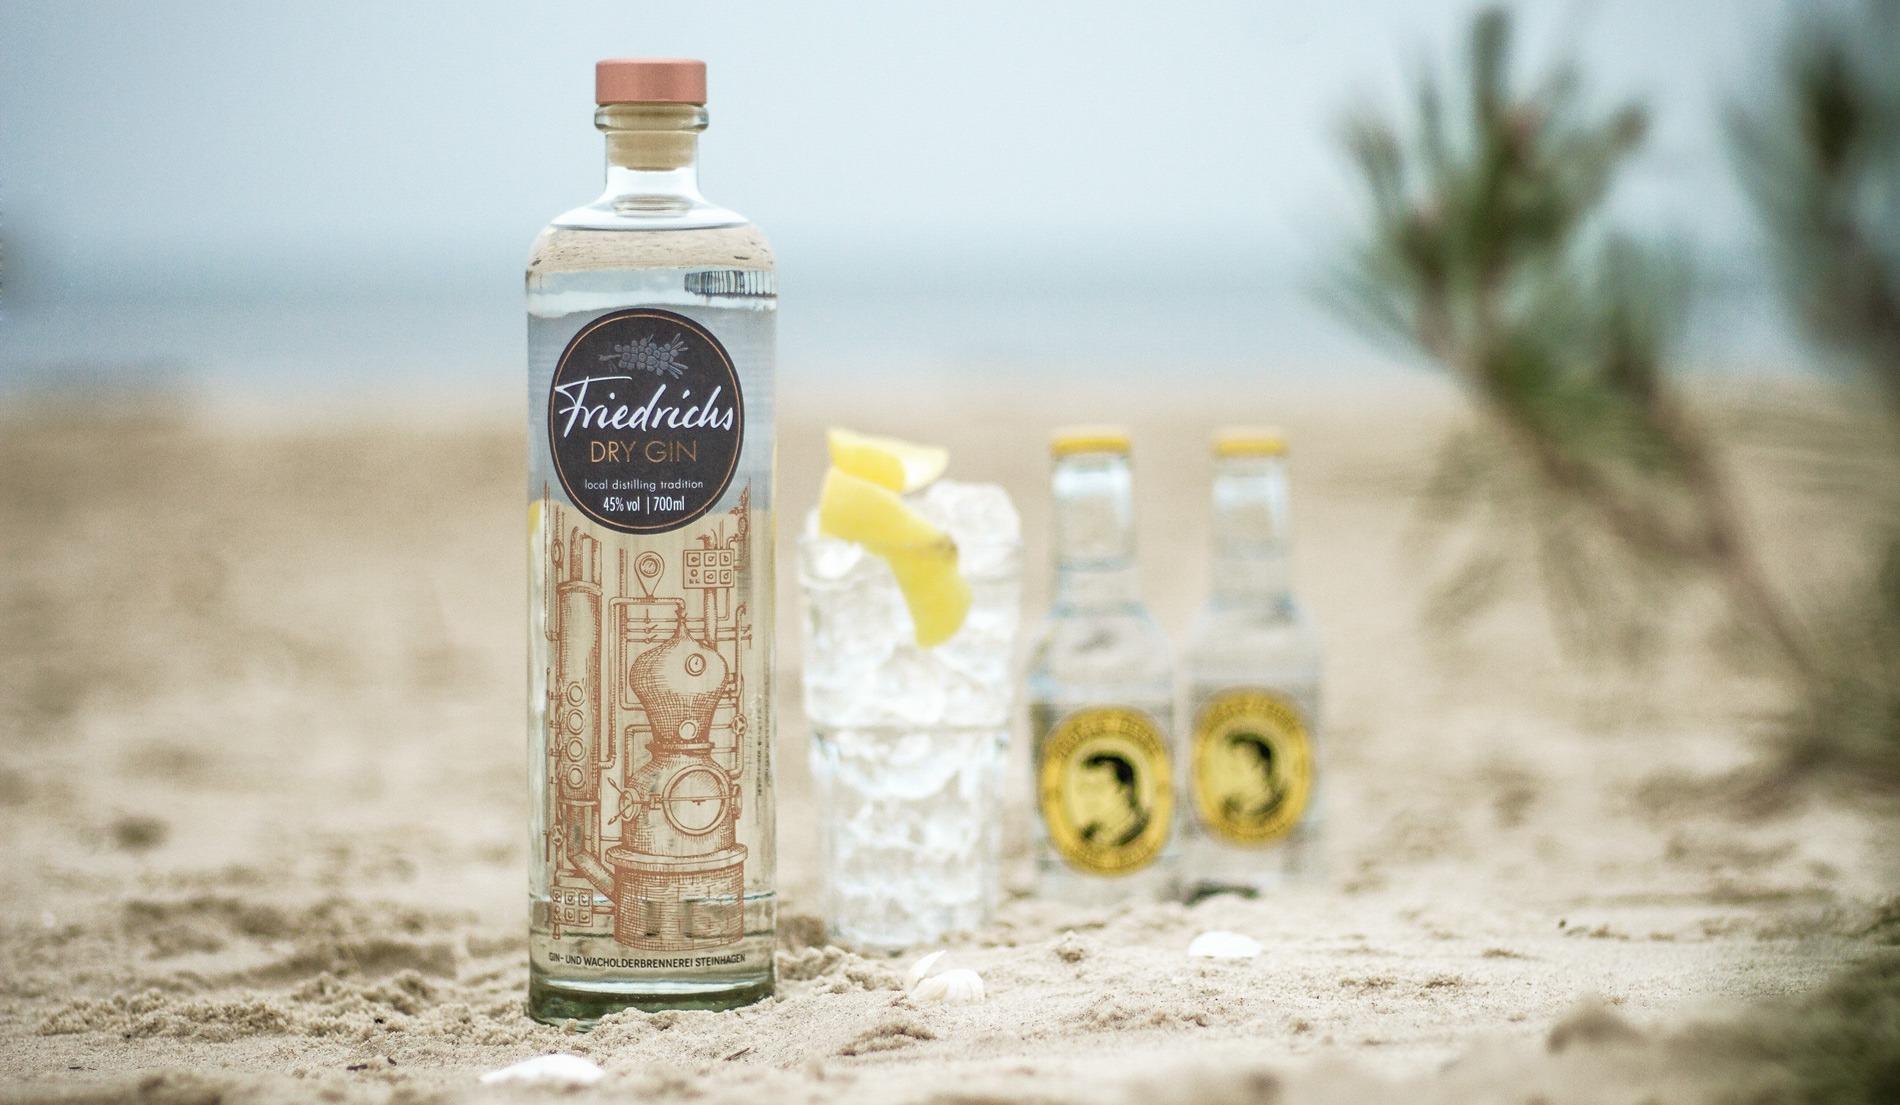 friedrichs dry gin am strand